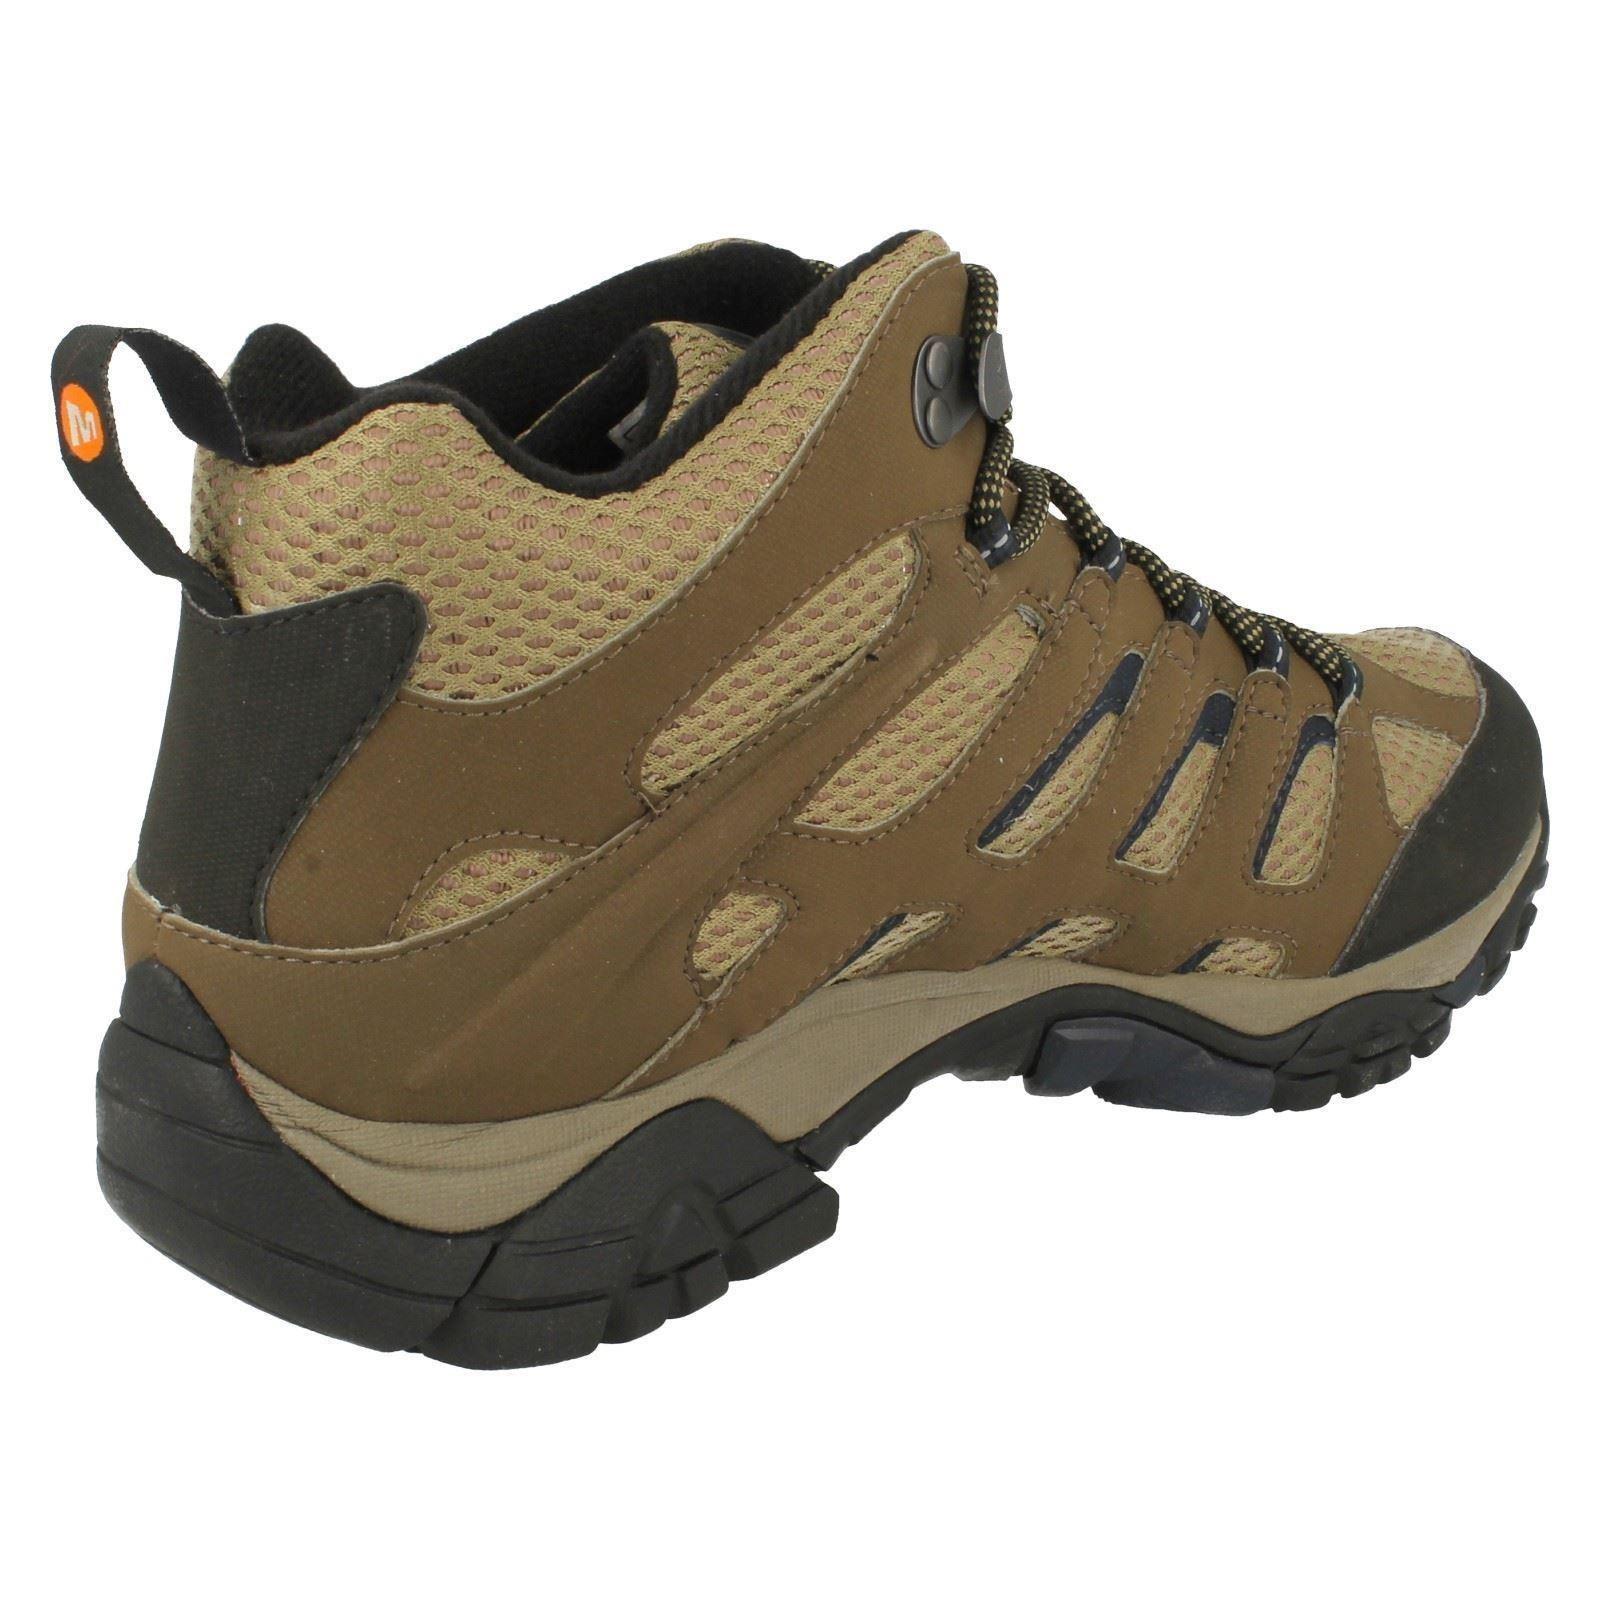 Mens Merrell Lace Up Walking Walking Walking Boots Moab Mid 7613b8